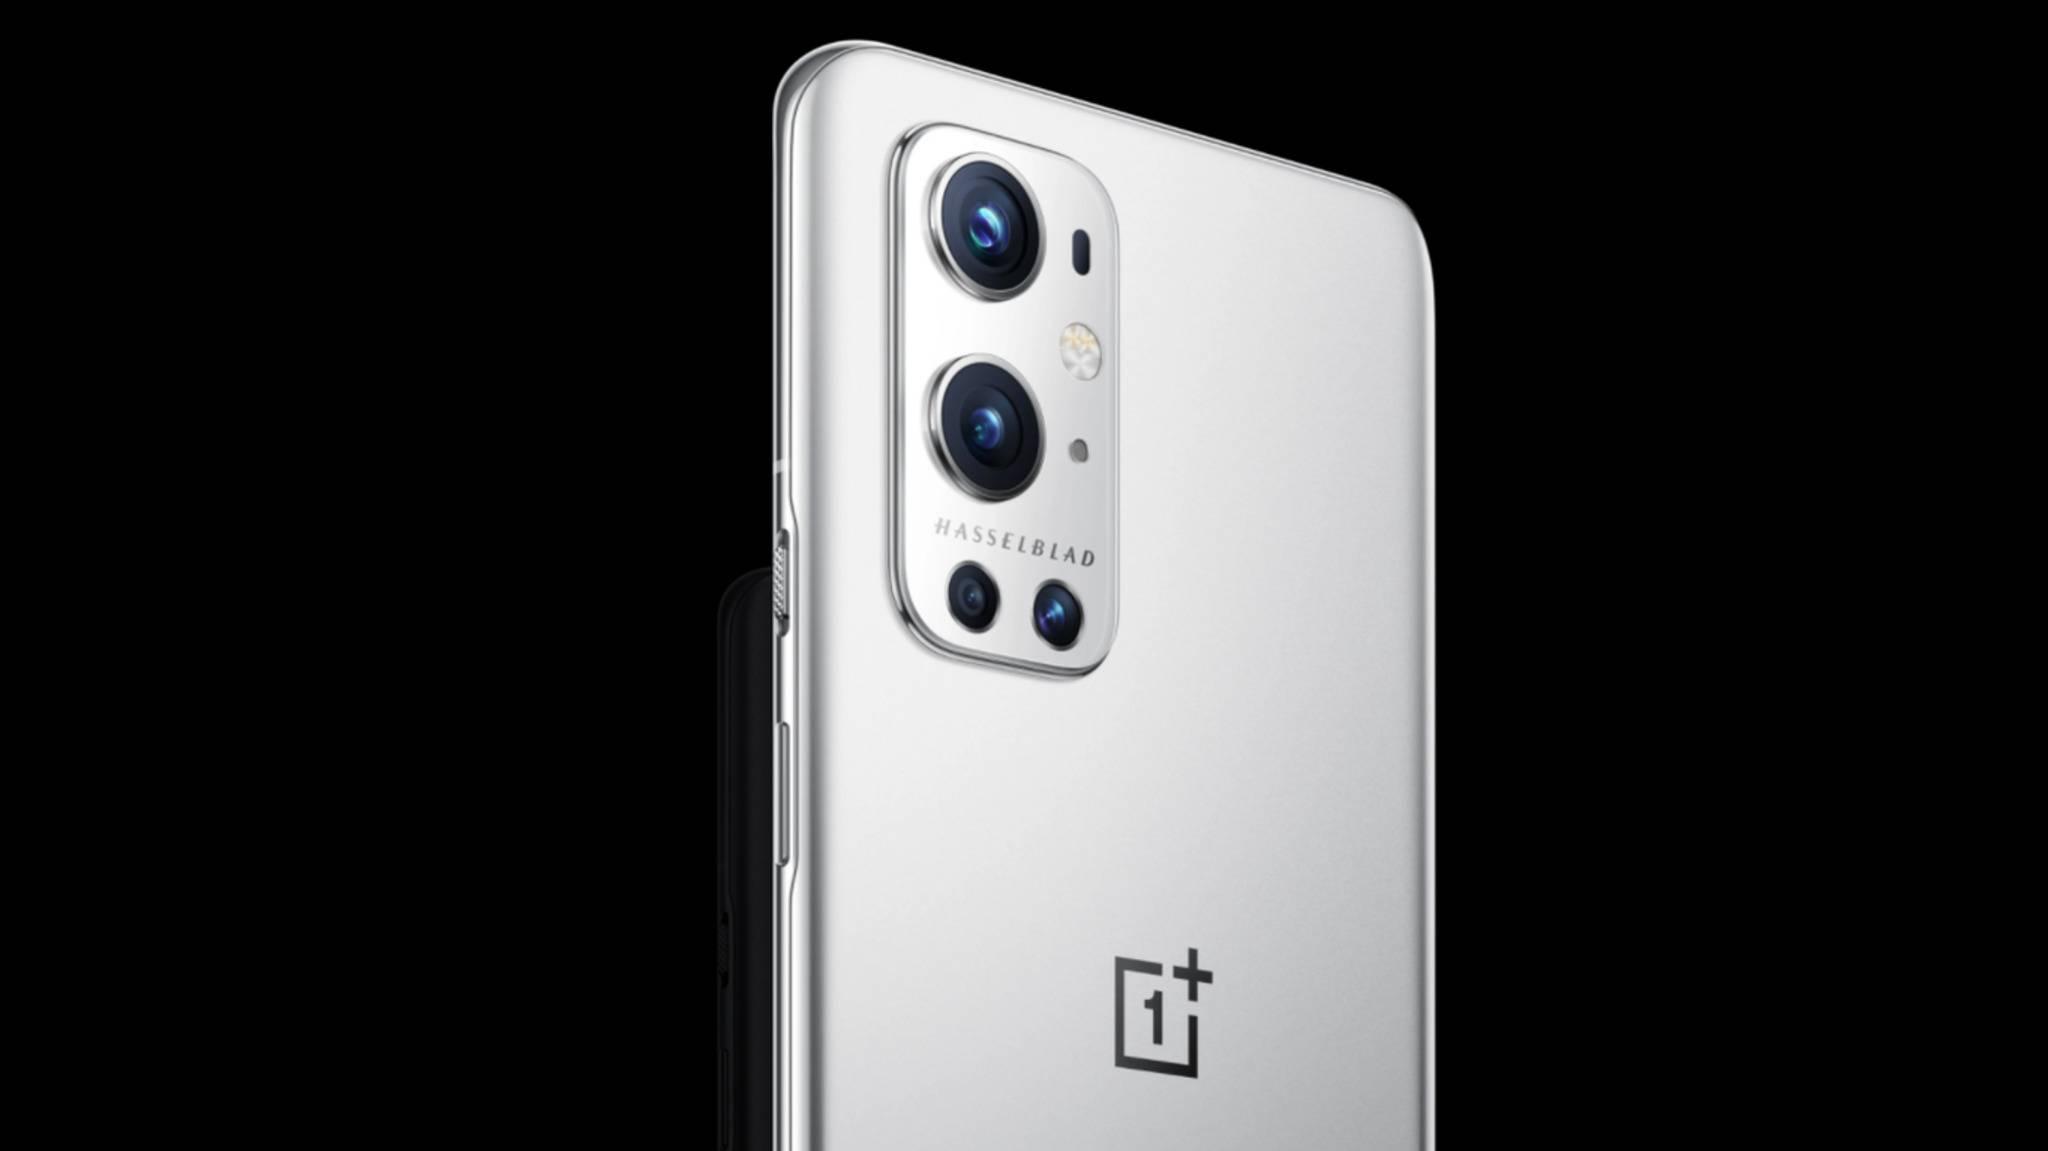 oneplus-9-pro-smartphone